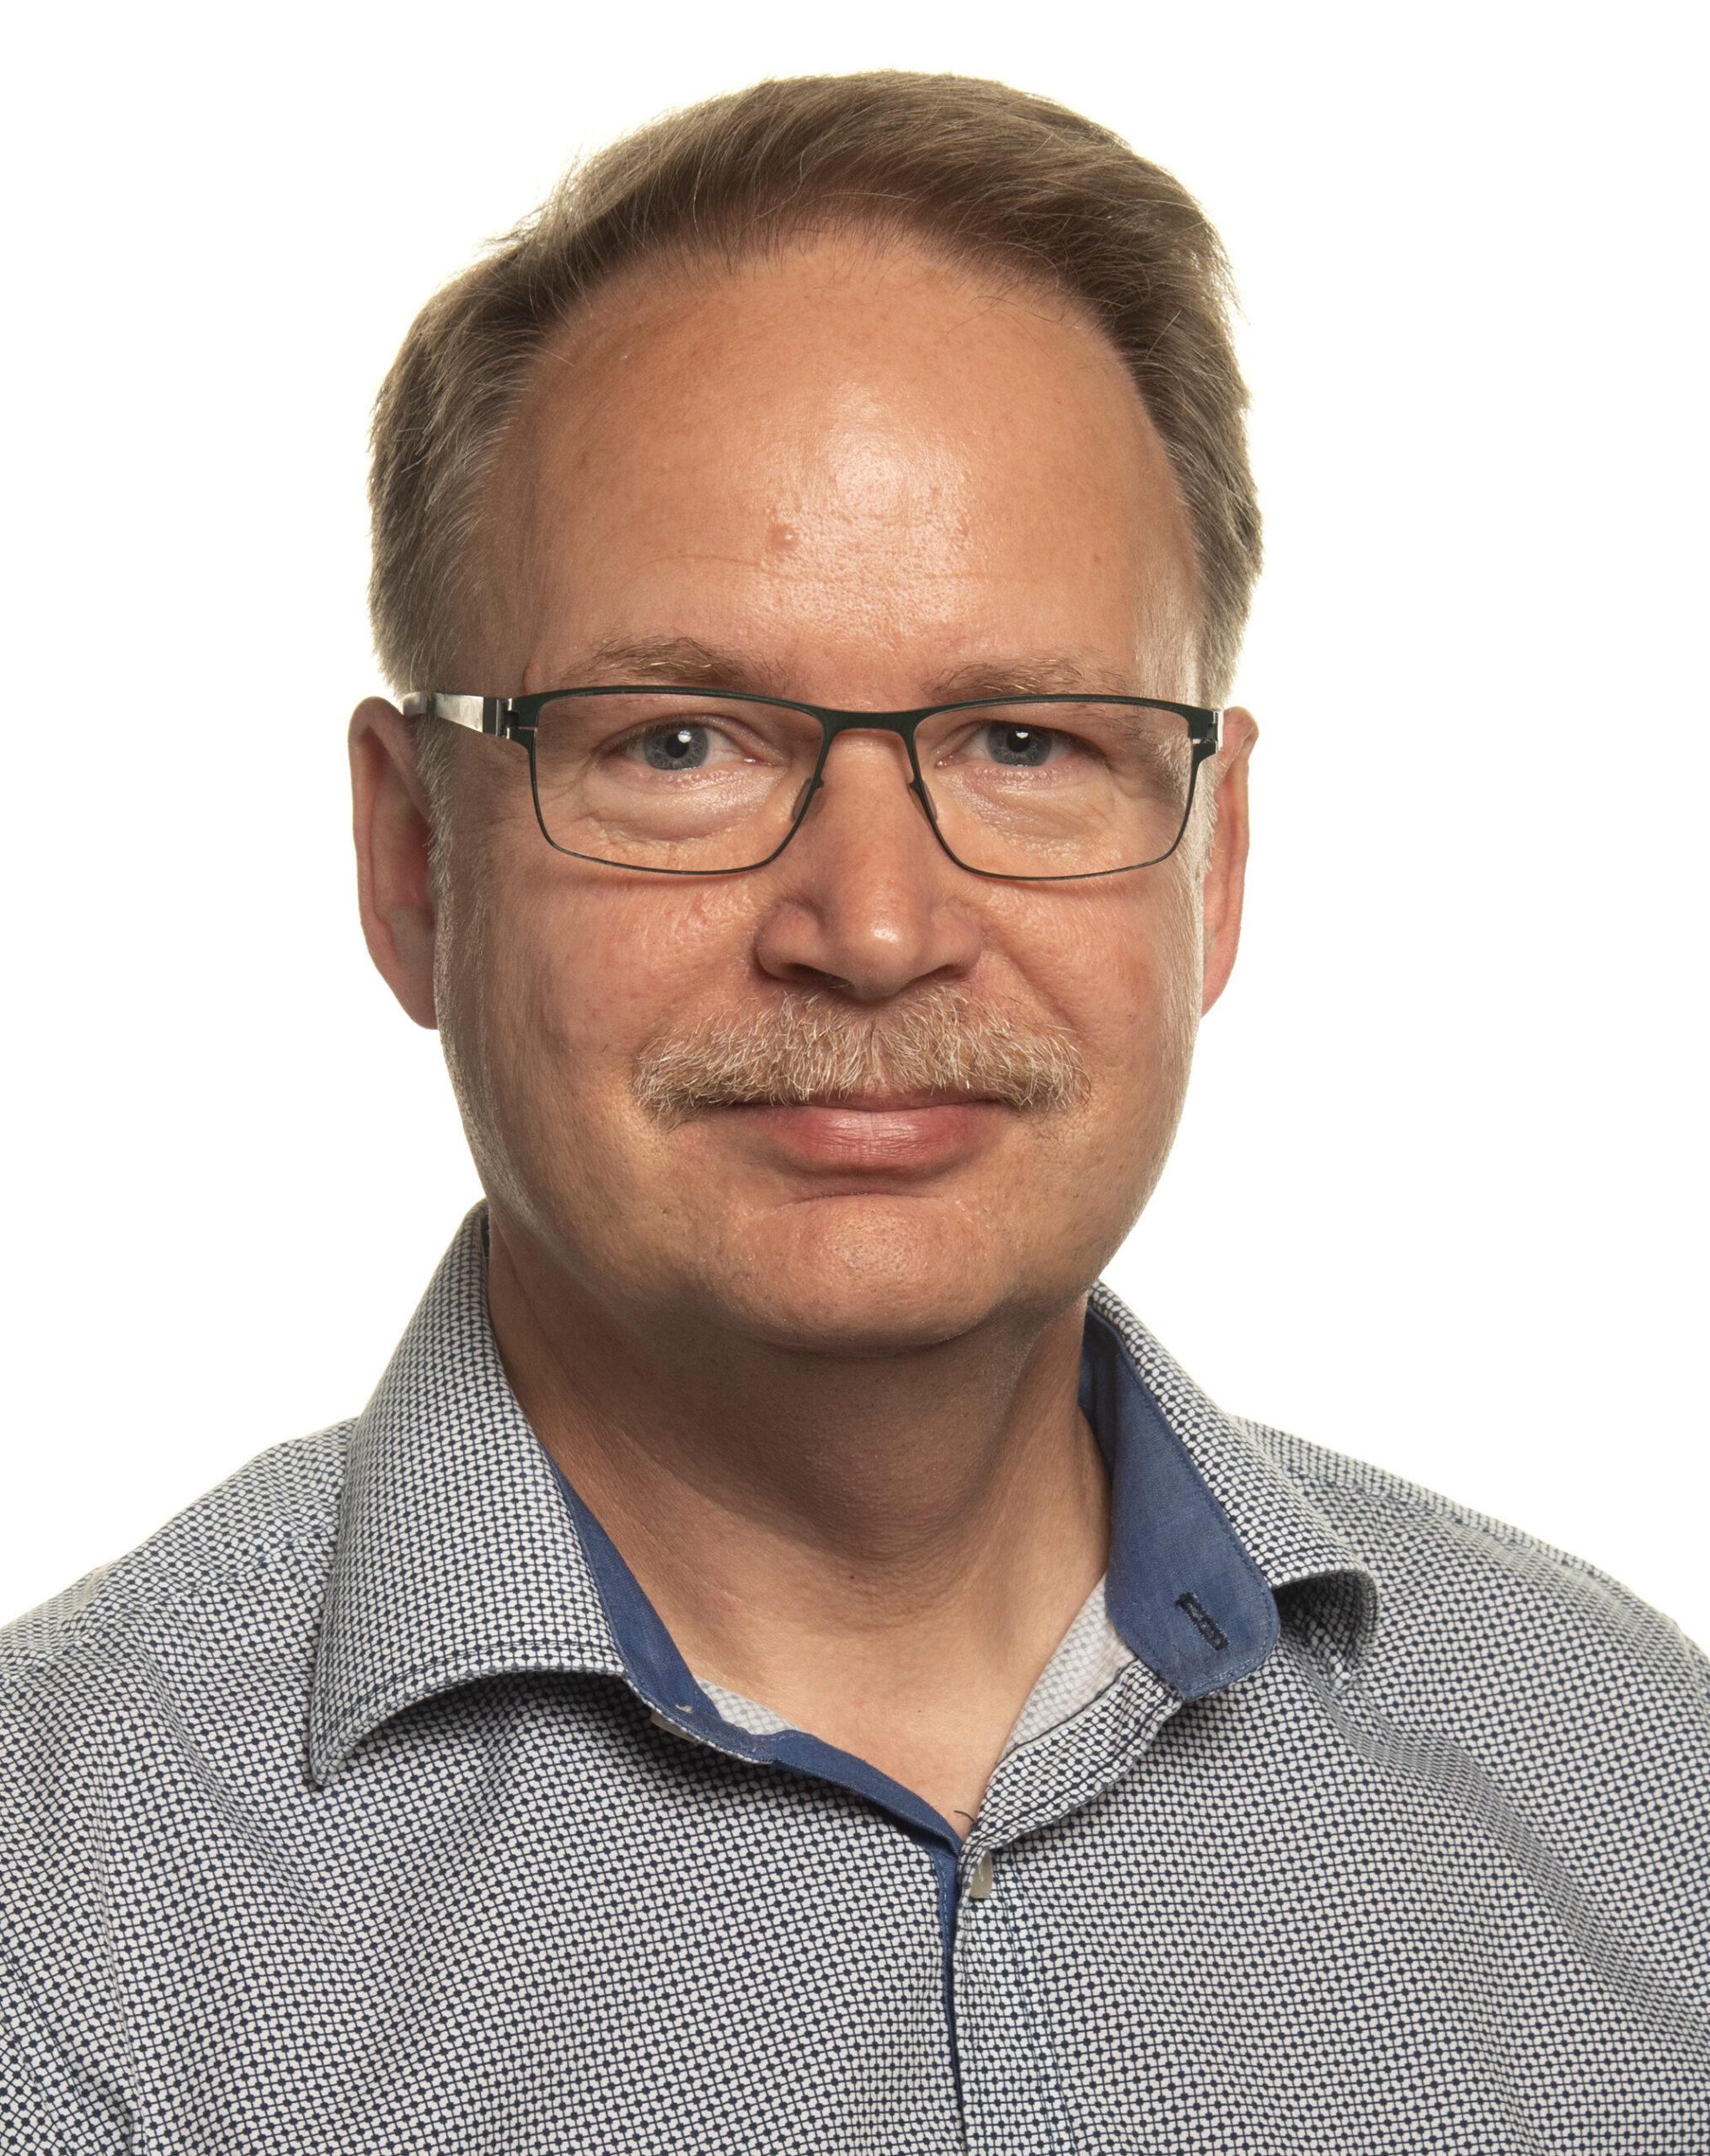 Tom Myrdal